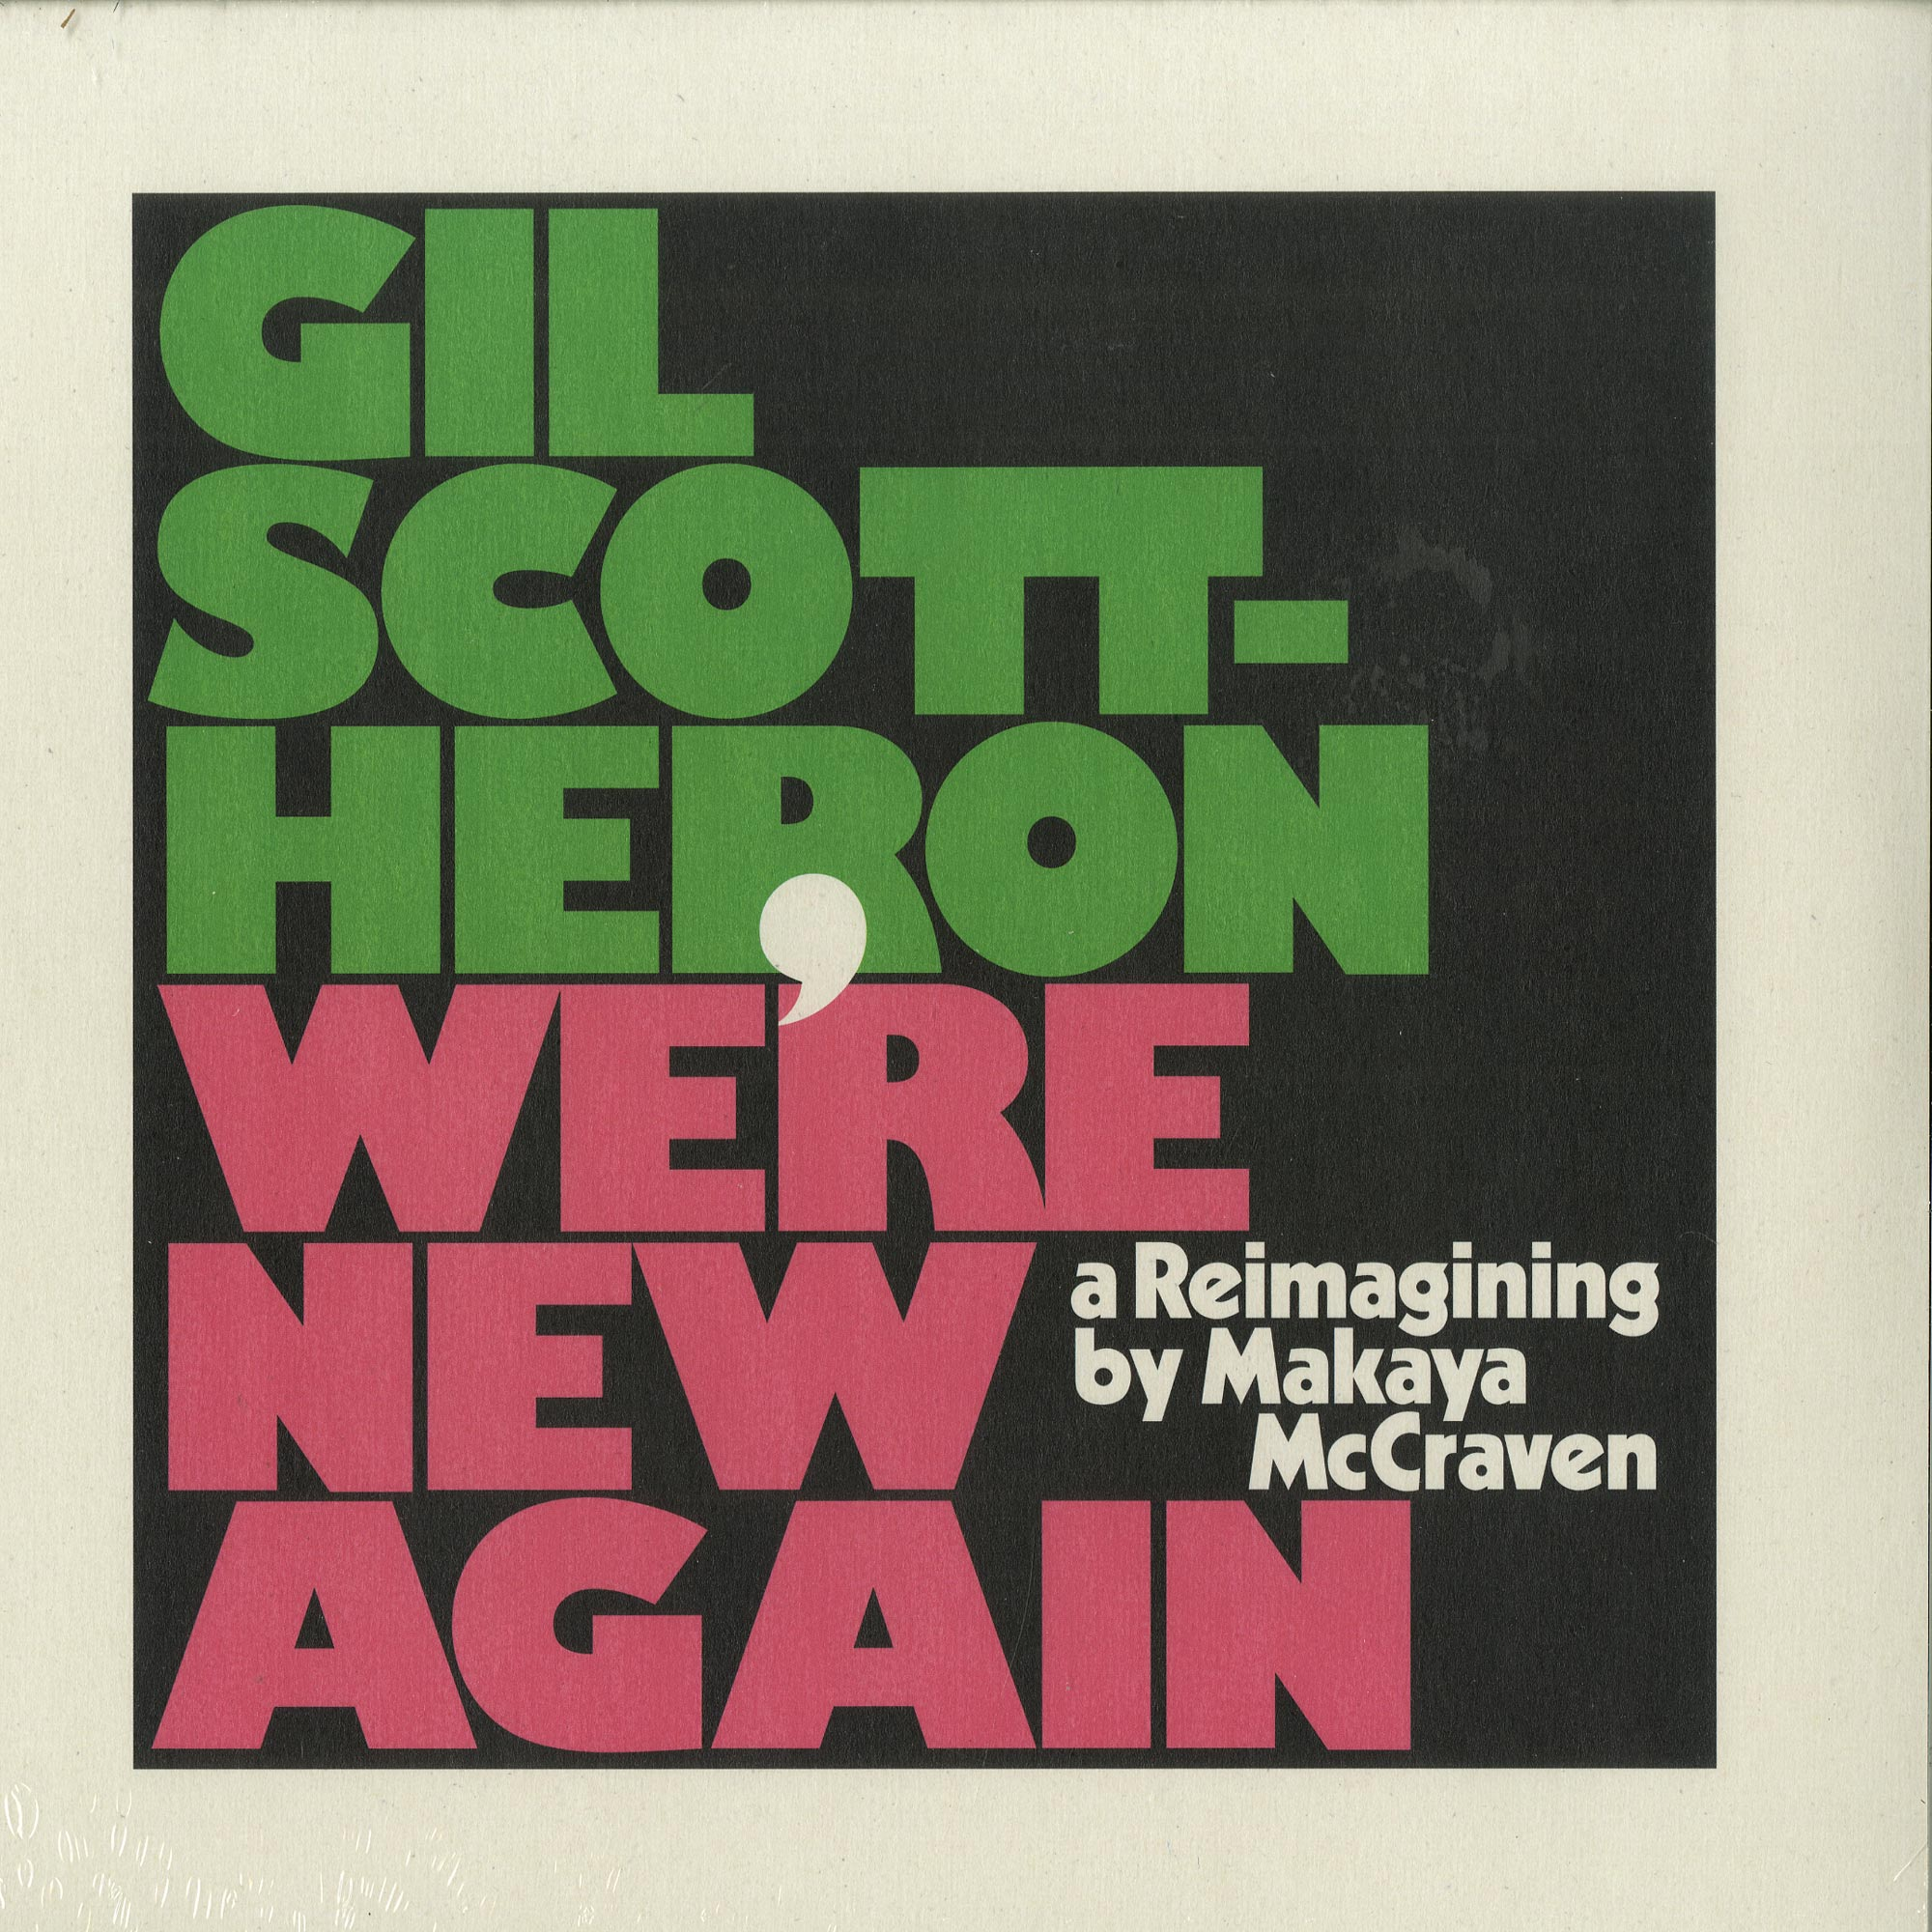 Gil Scott-Heron - WERE NEW AGAIN - A REIMAGINING BY MAKAYA MCCRAVEN